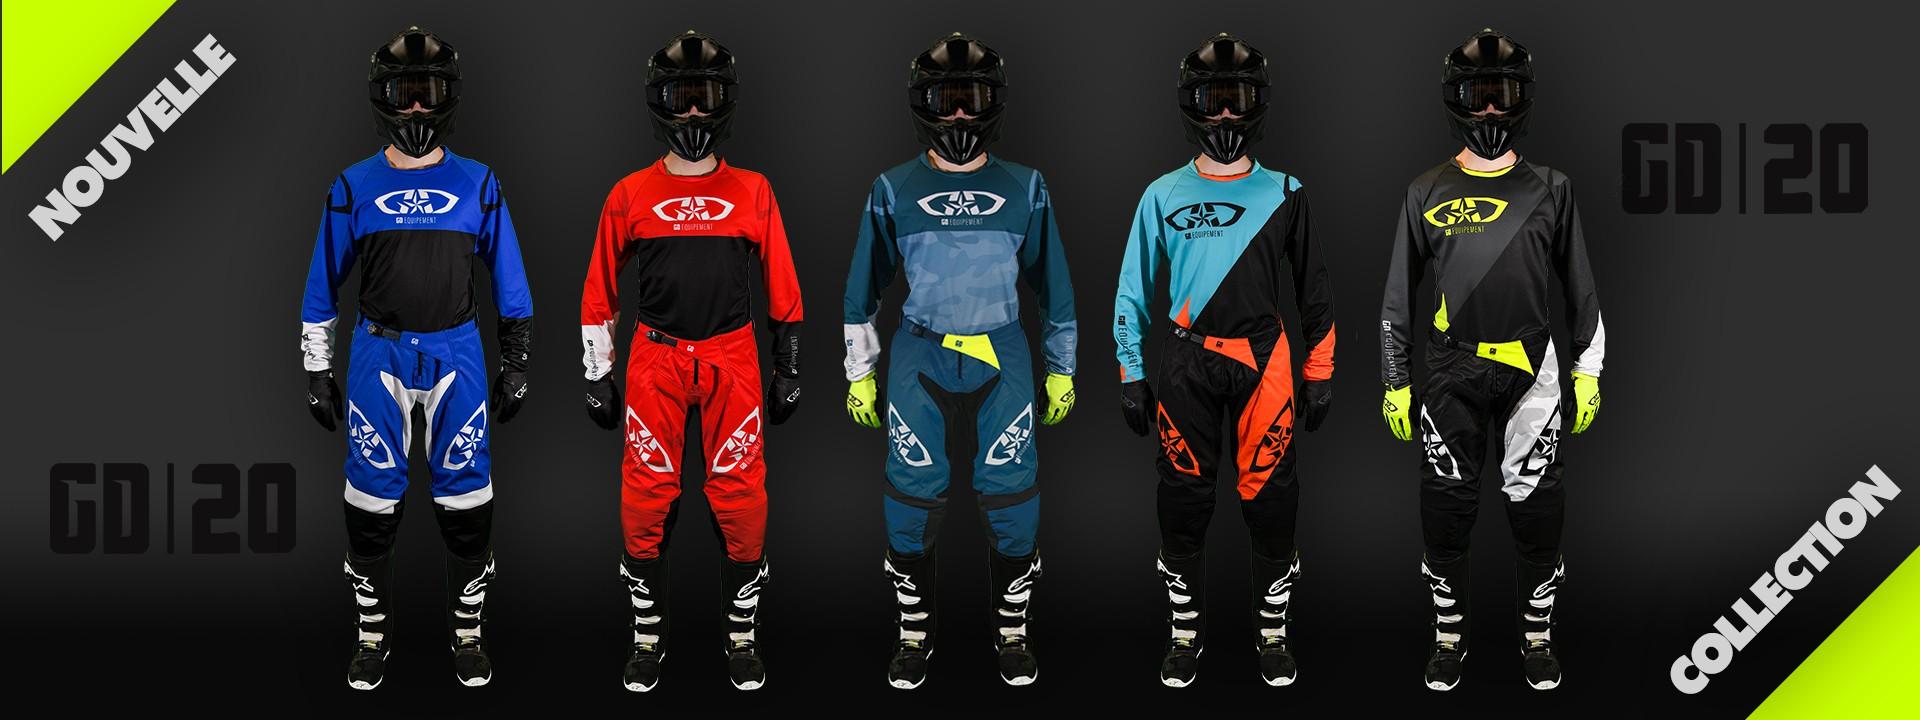 Equipement 2020 : tenue motocross MX SX - enduro - quad - VTT - DH - BMX